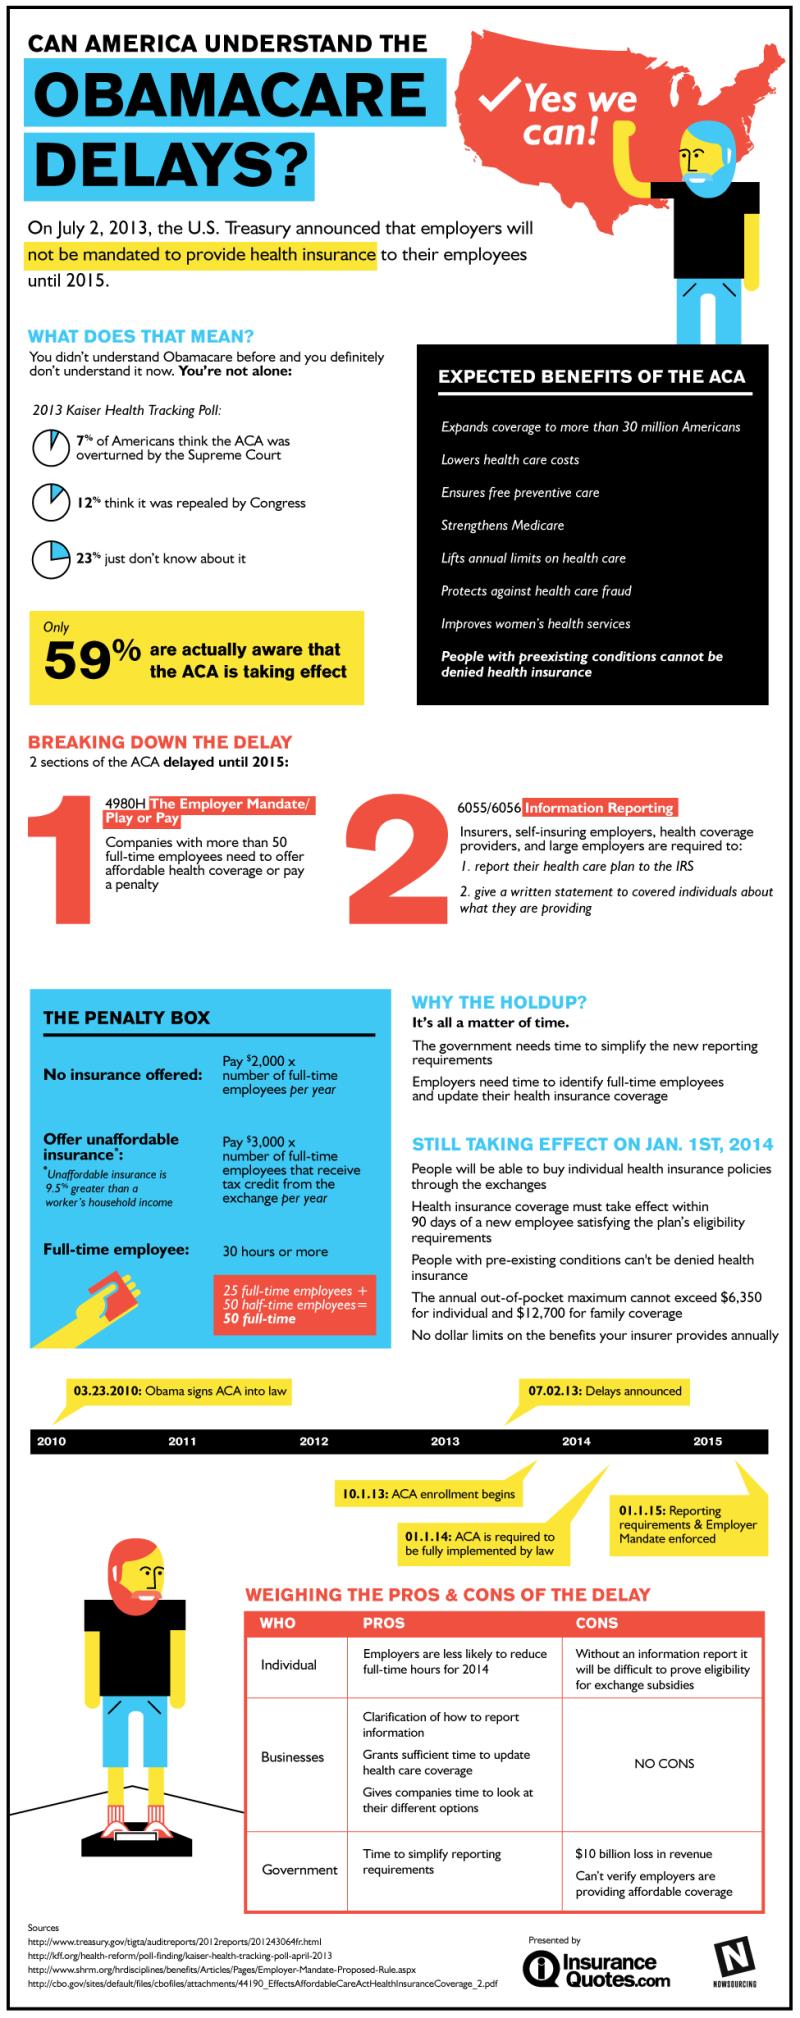 Understanding the Obamacare delays